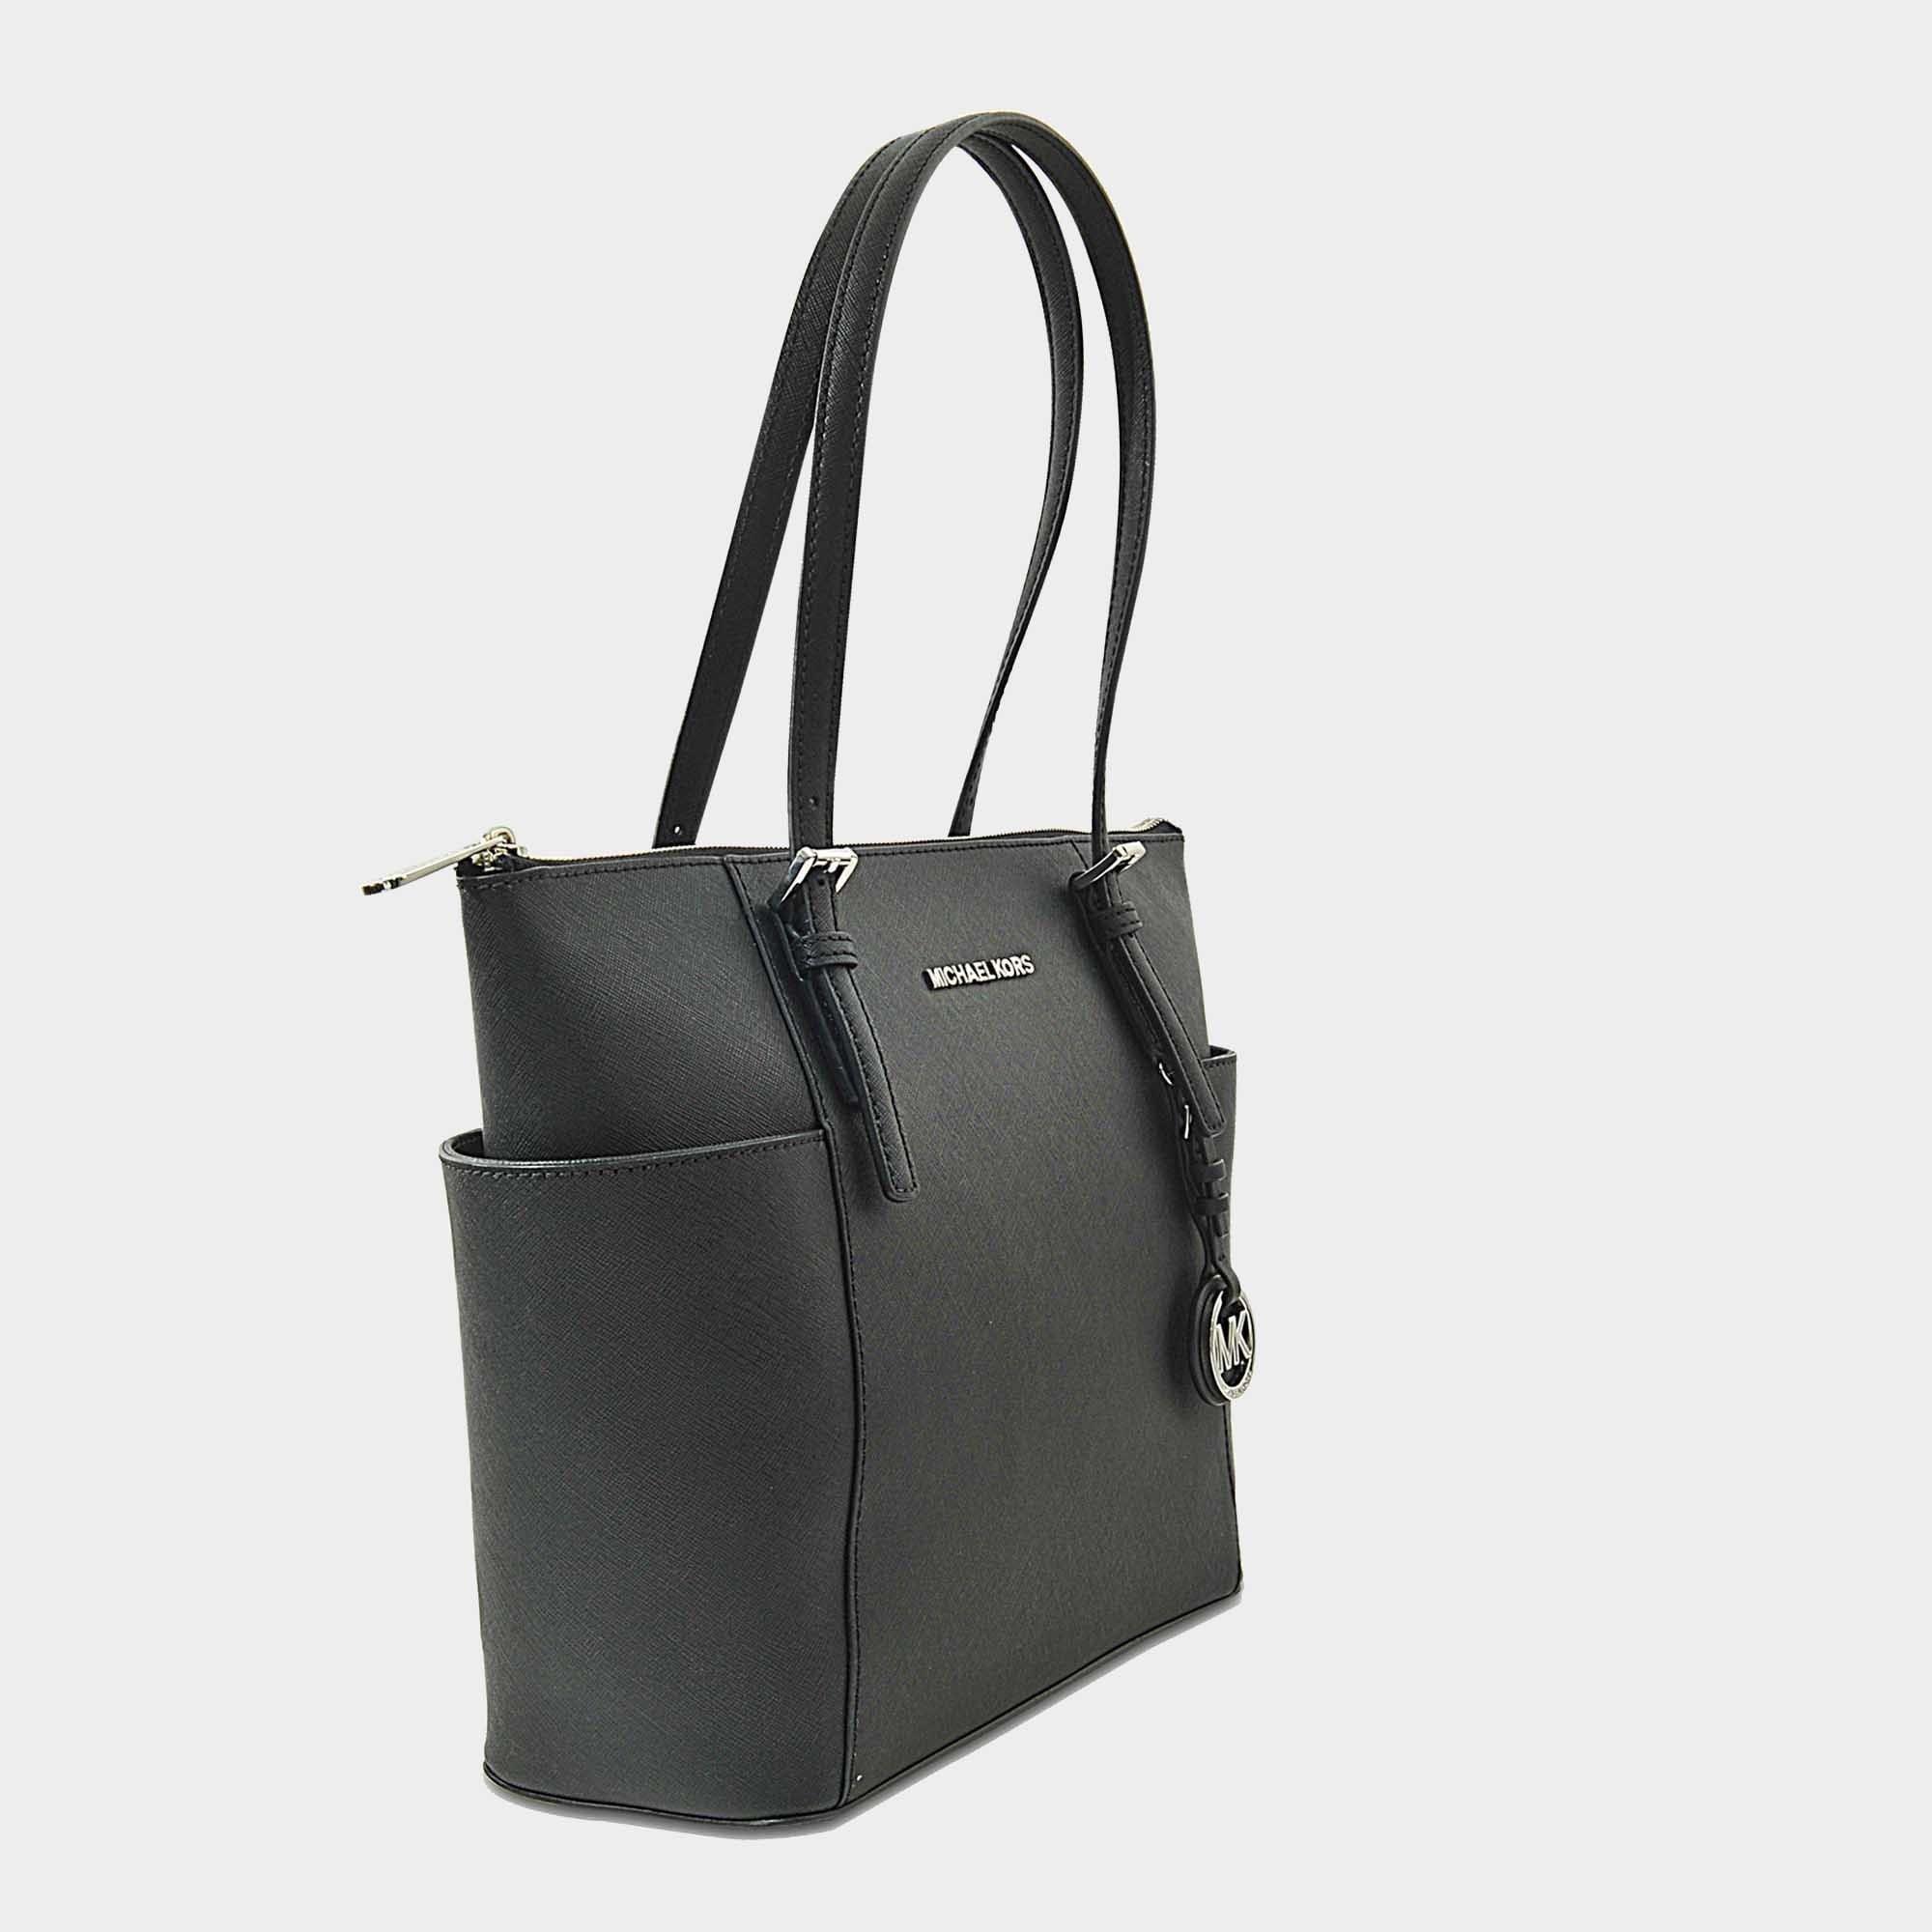 MICHAEL Michael Kors Leather Jet Set Item East/west Top Zip Tote Bag In Black Grained Calfskin